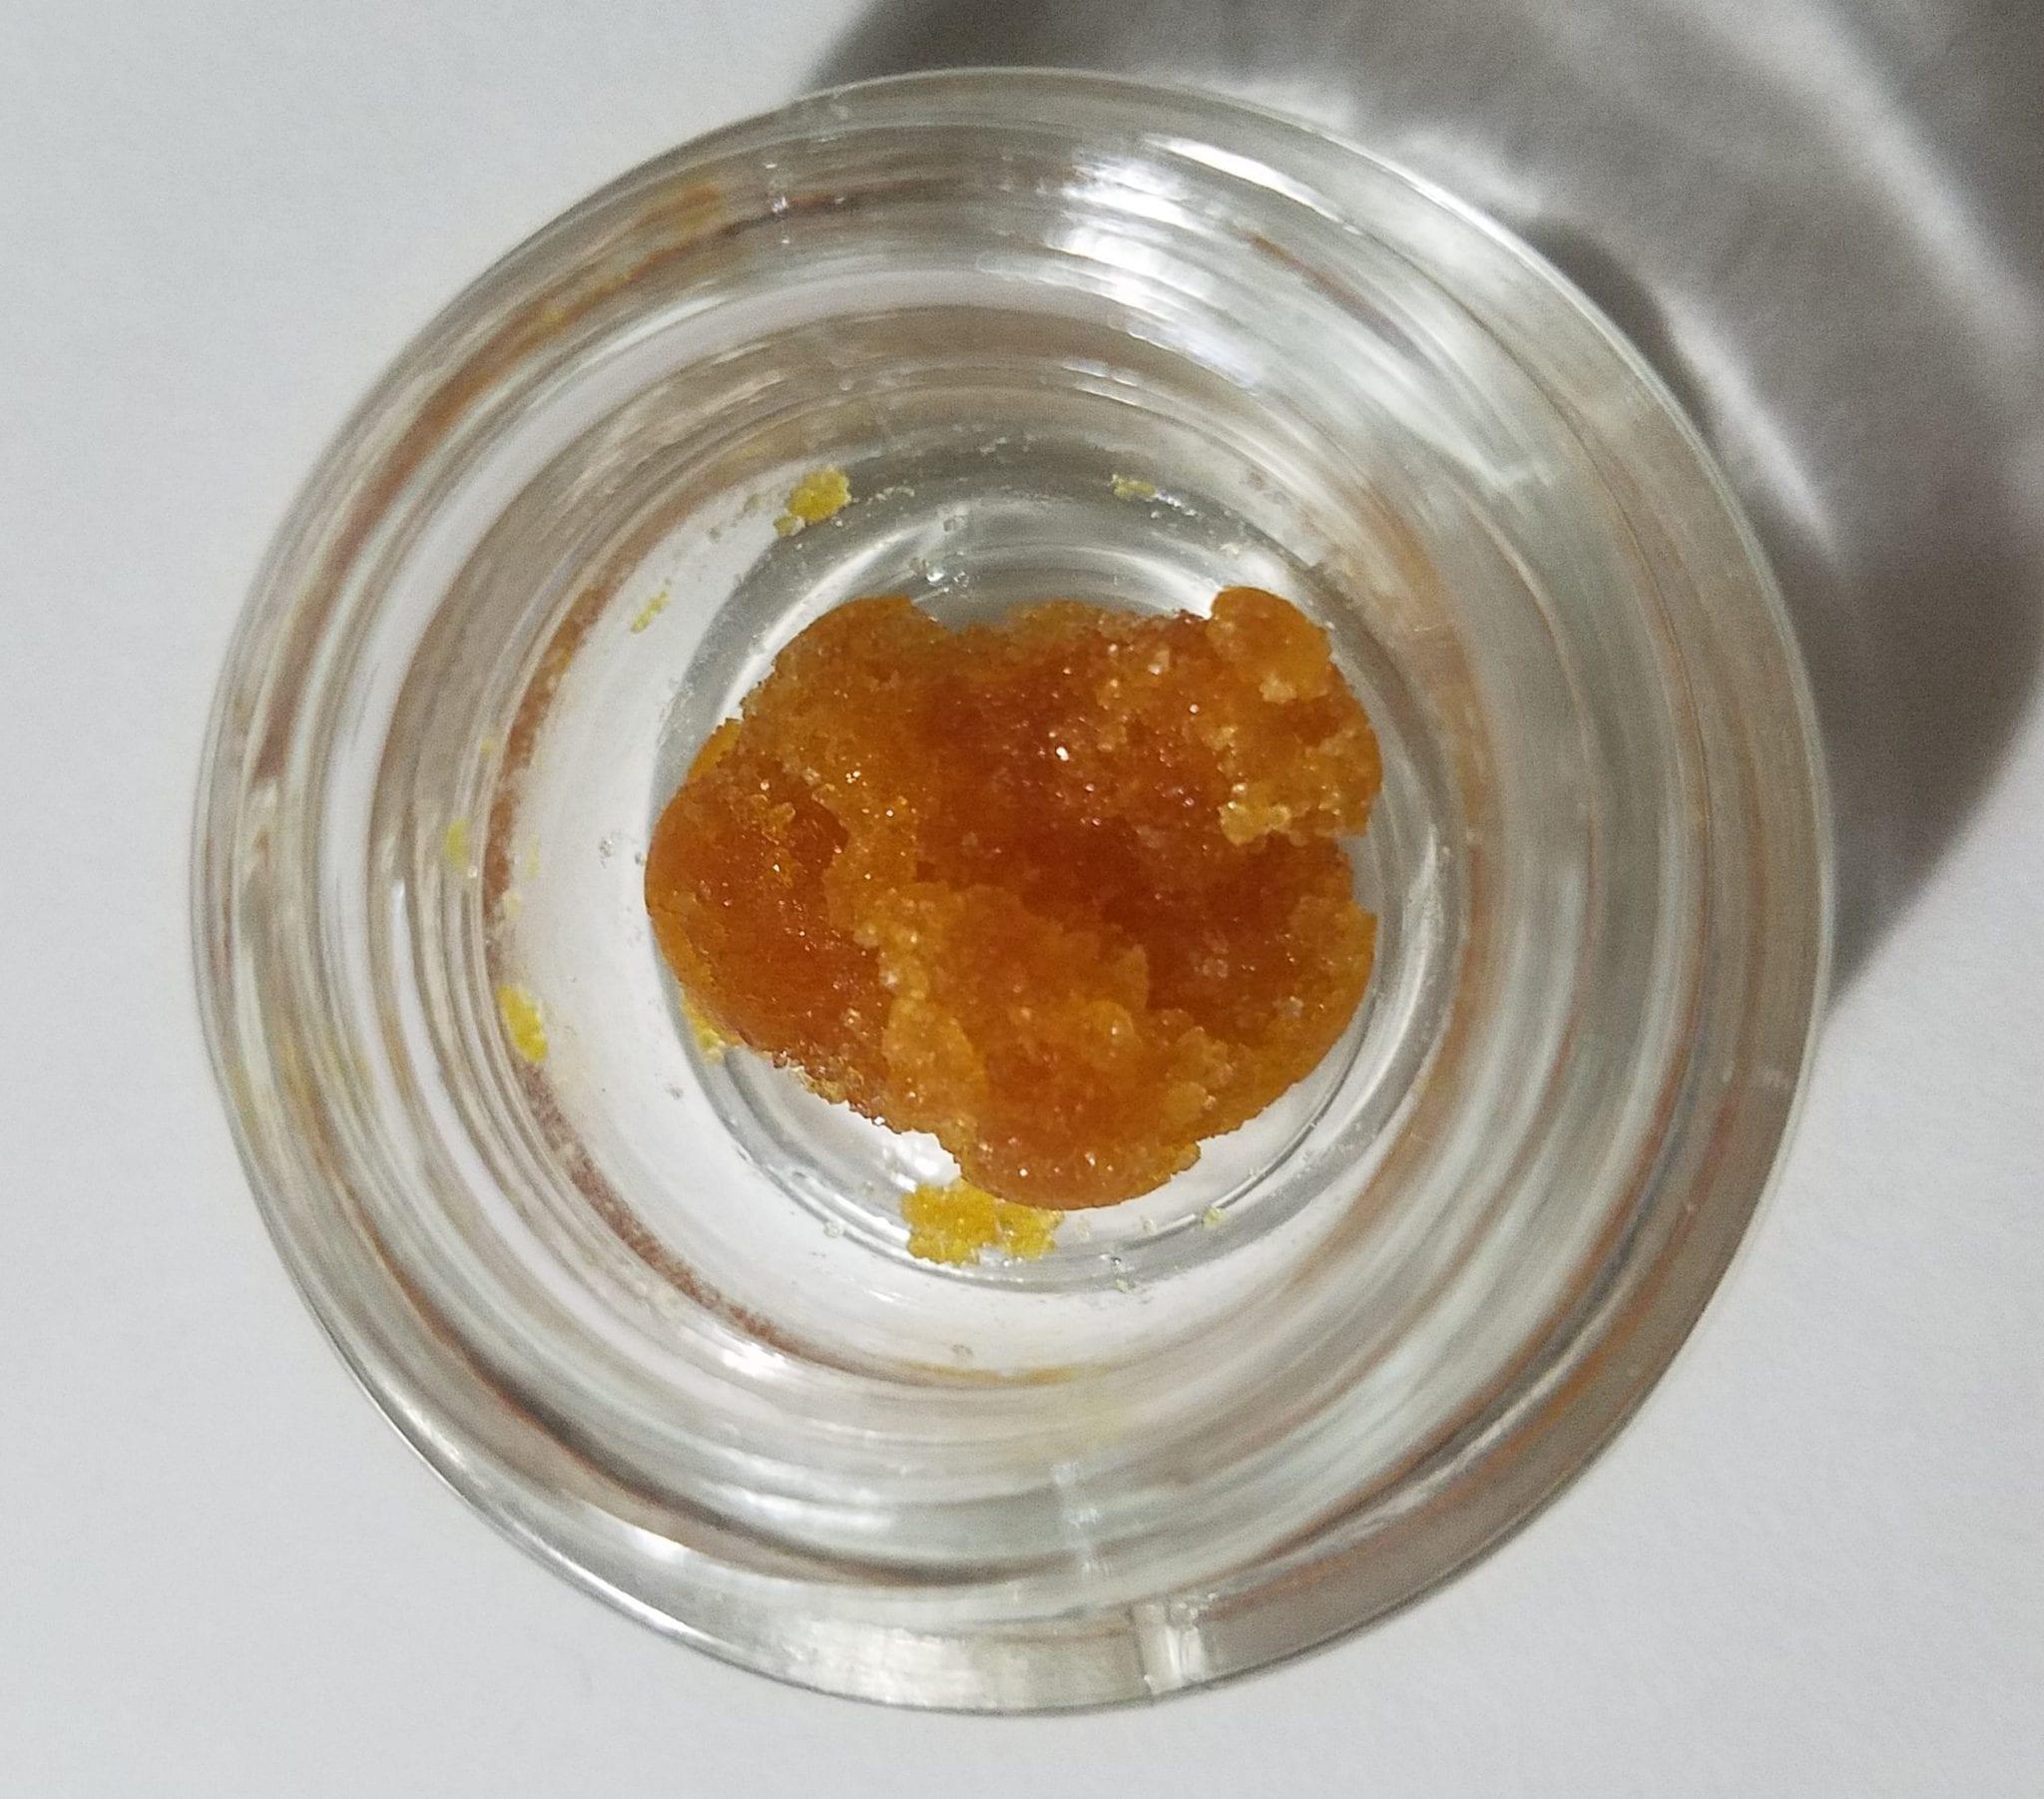 Pacific Frost jar open